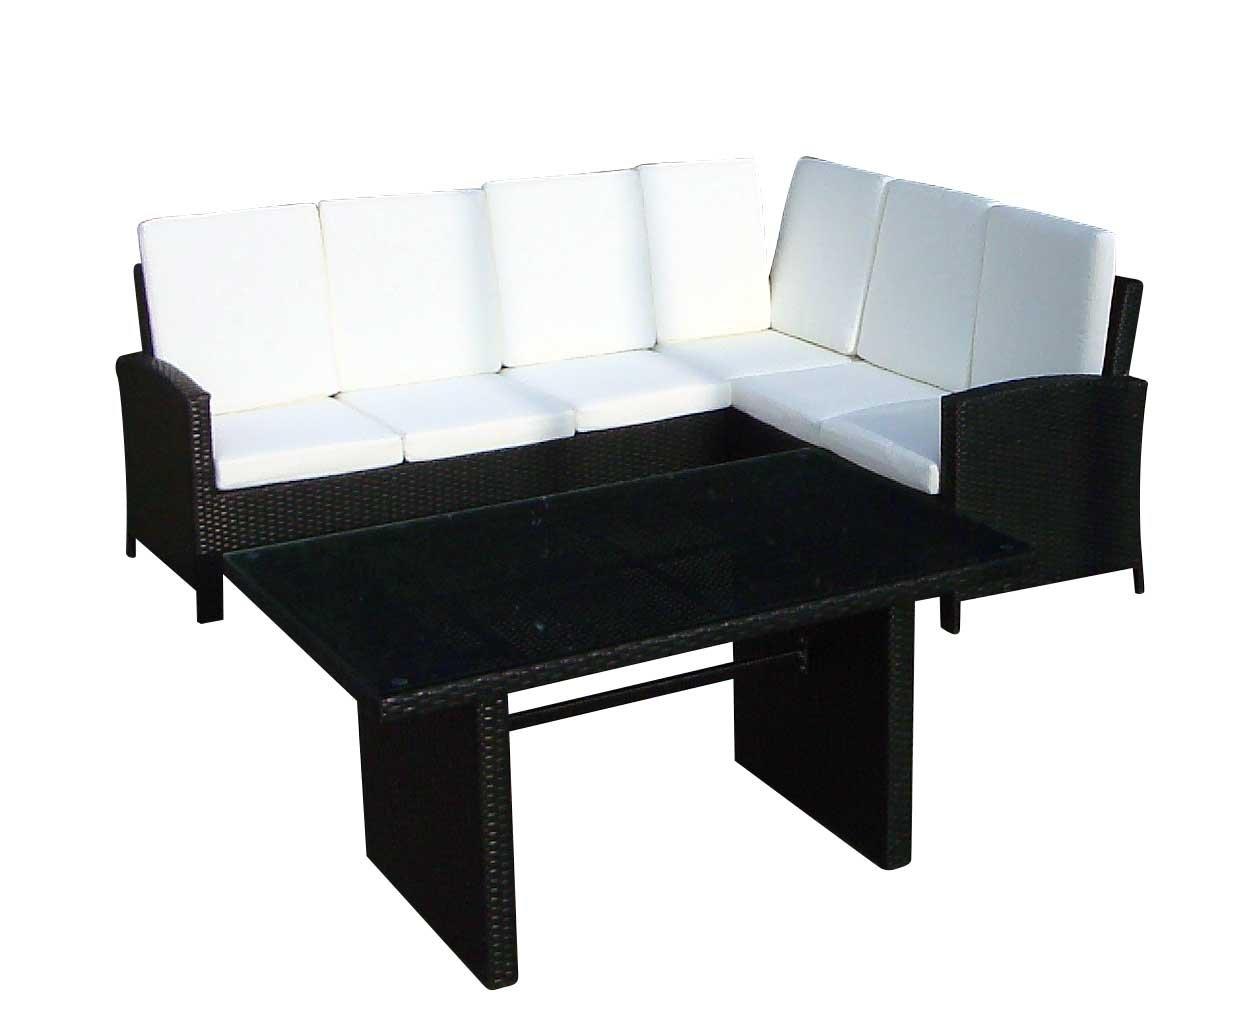 Baidani 10c00040.00001 Sitzgruppe Suntrap, 2-teilig, schwarz günstig bestellen